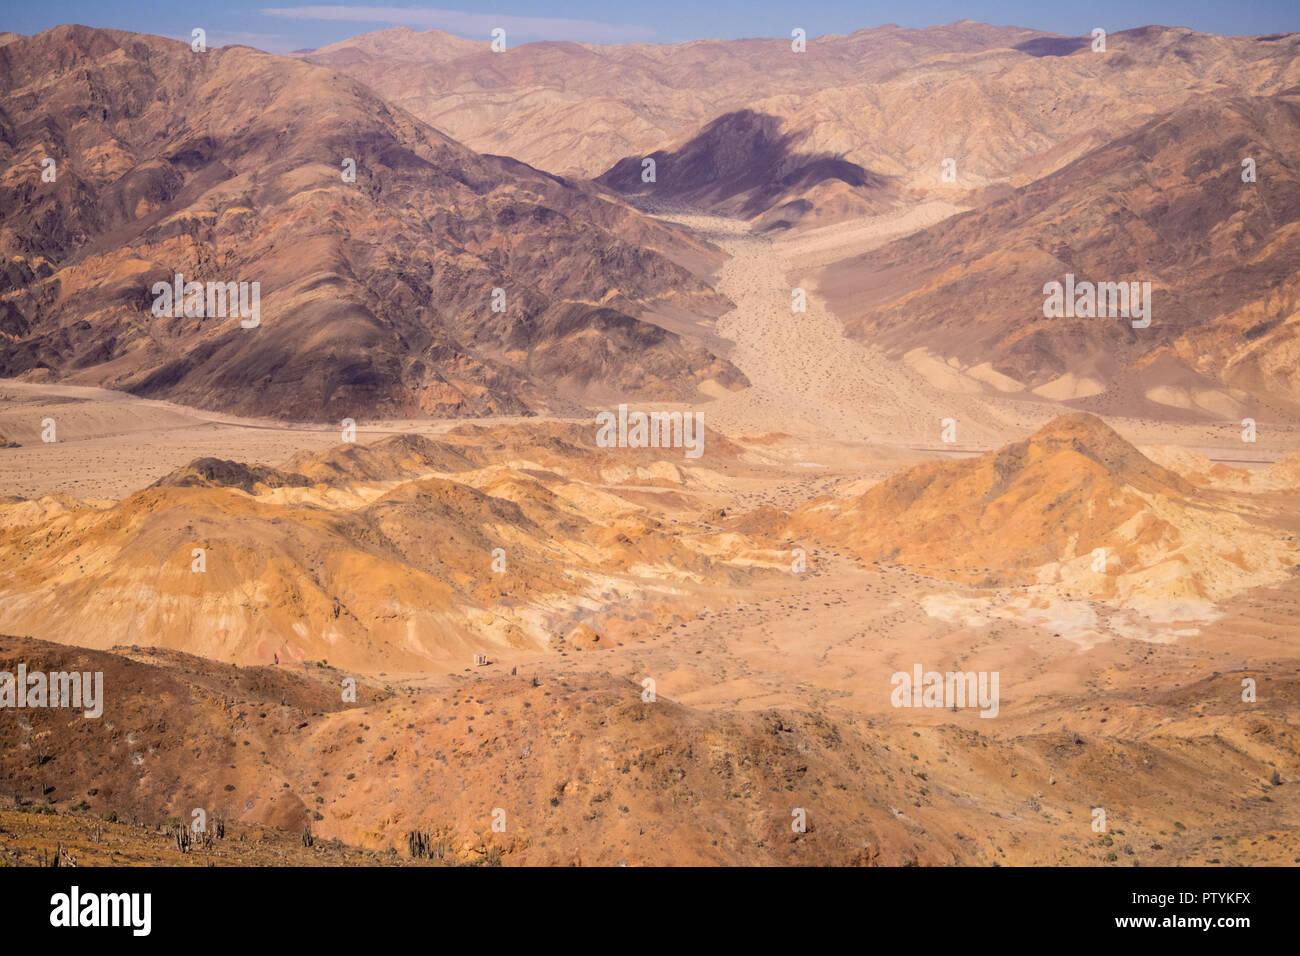 Pan de Azucar National Park, in the Atacama Desert is the best place to understand how life grows in the desert, coastline - Stock Image